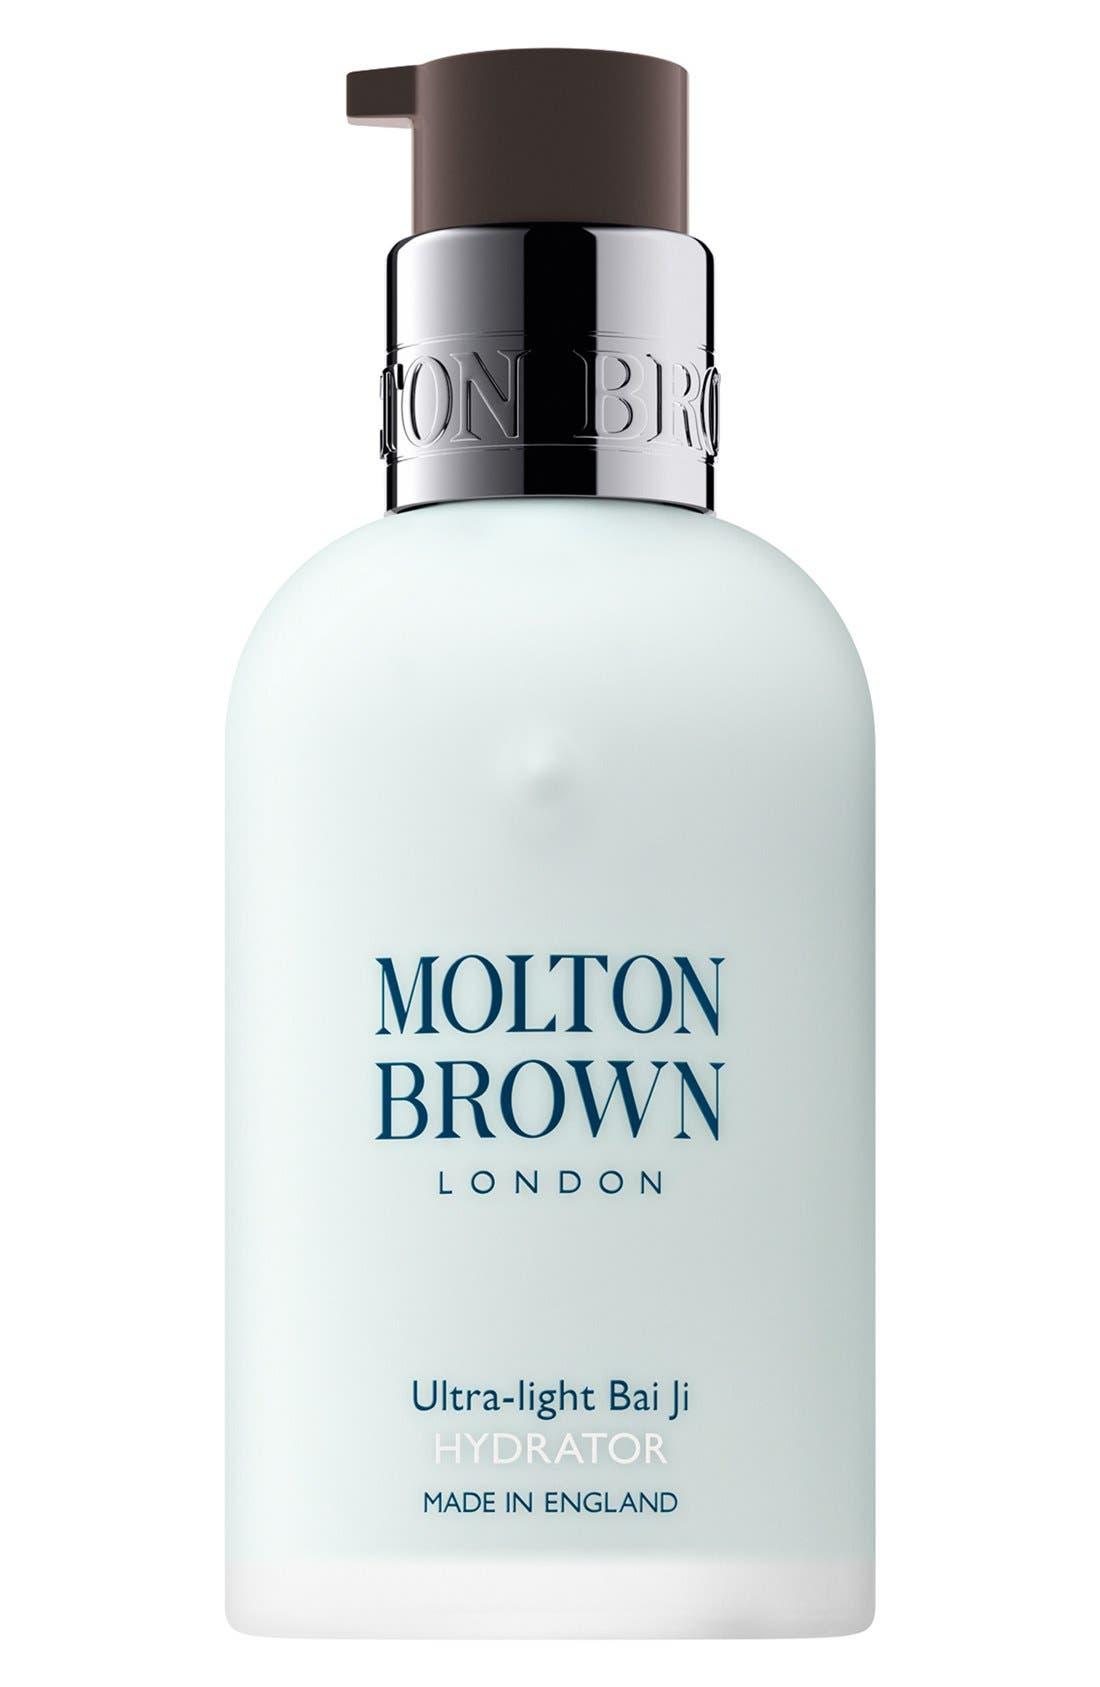 MOLTON BROWN London 'Ultra Light Bai Ji' Hydrator